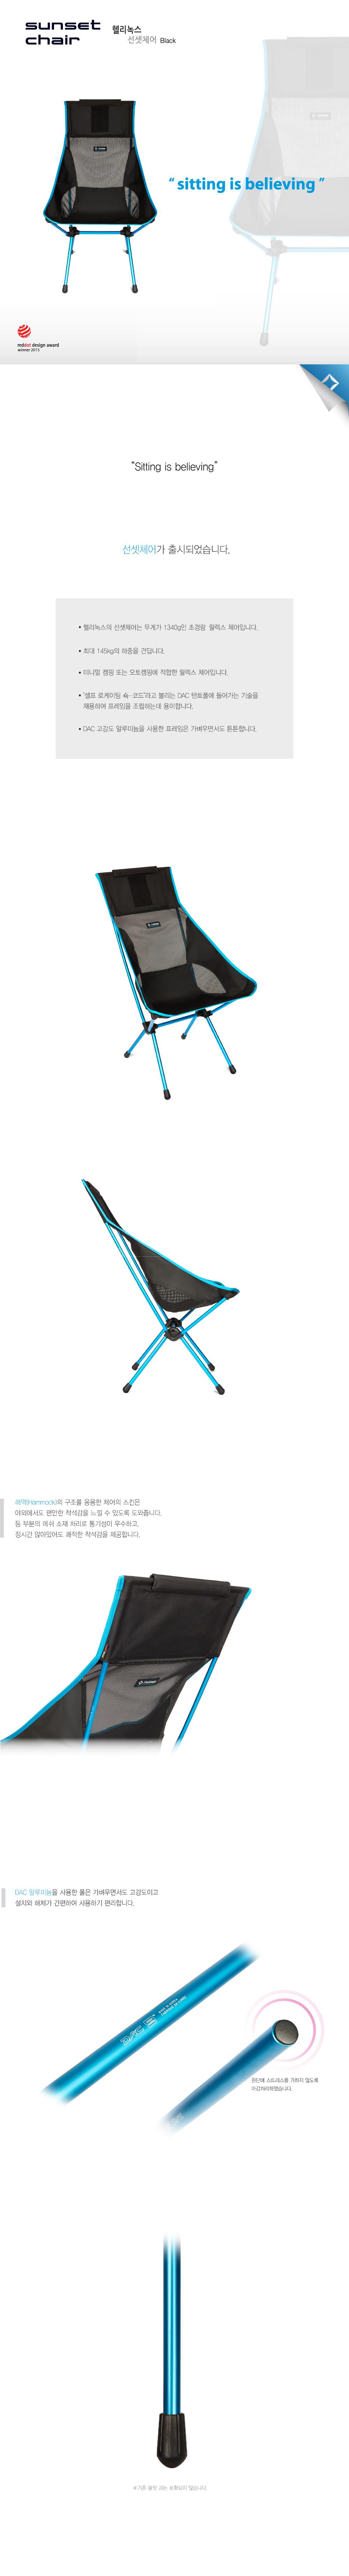 20150317-Helinox_sunset-chair-상세페이지.jpg